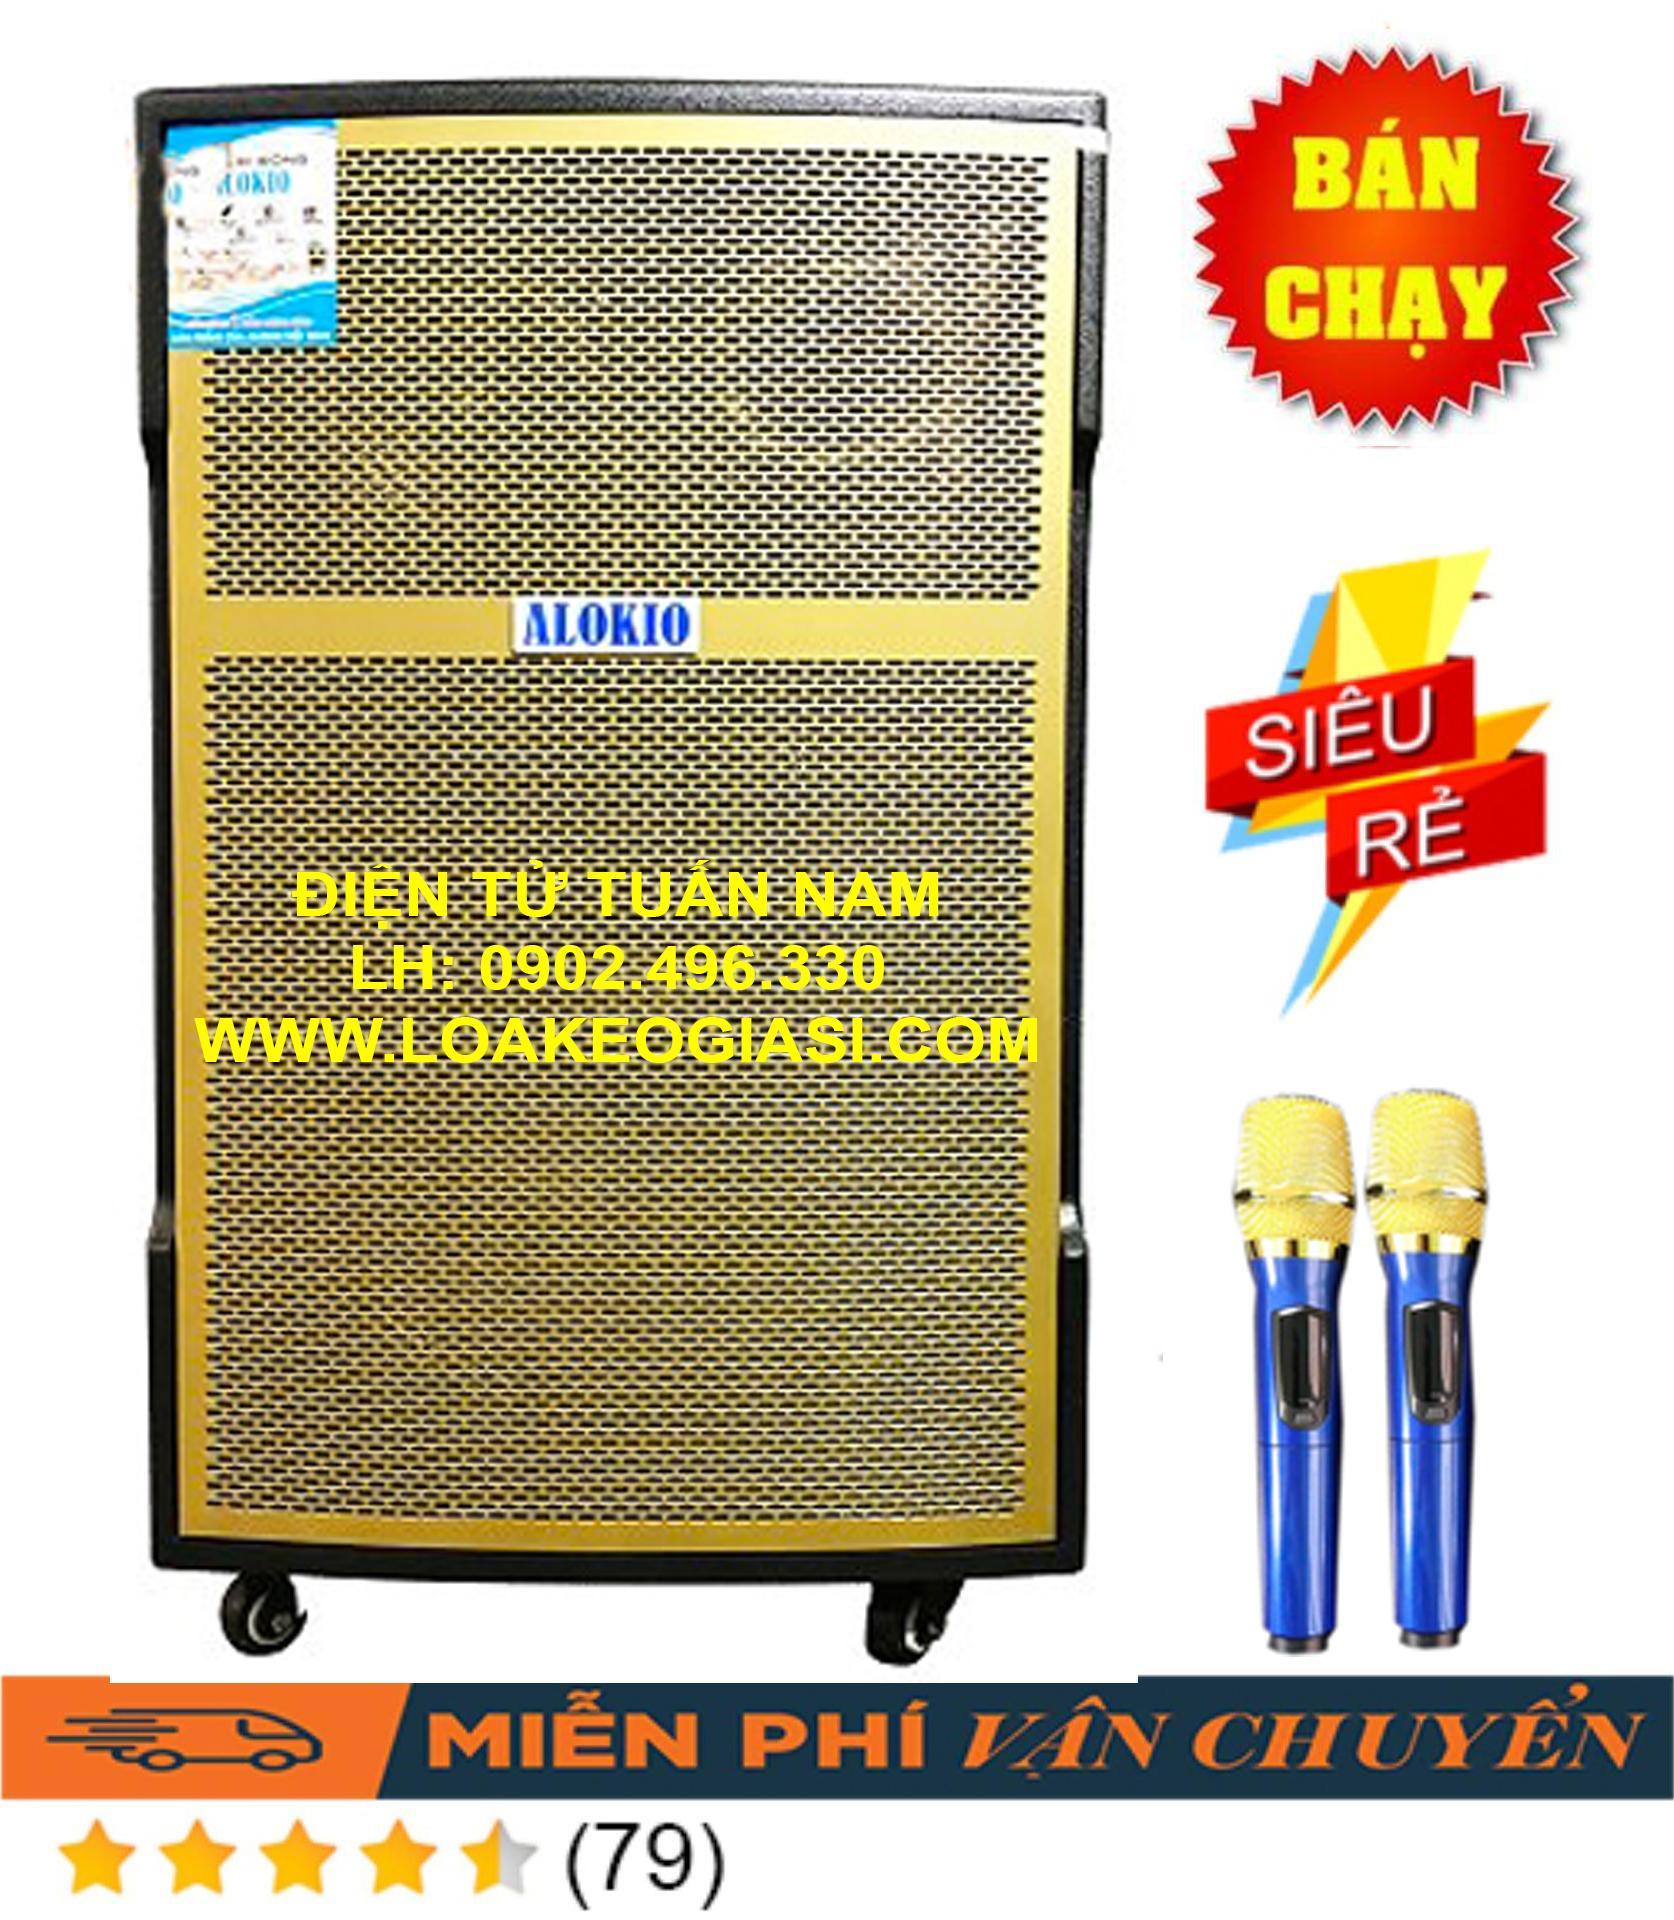 Tube-03 Hifi Buffer 6j1 Tube Pre-Amplifier Music Amplifier With